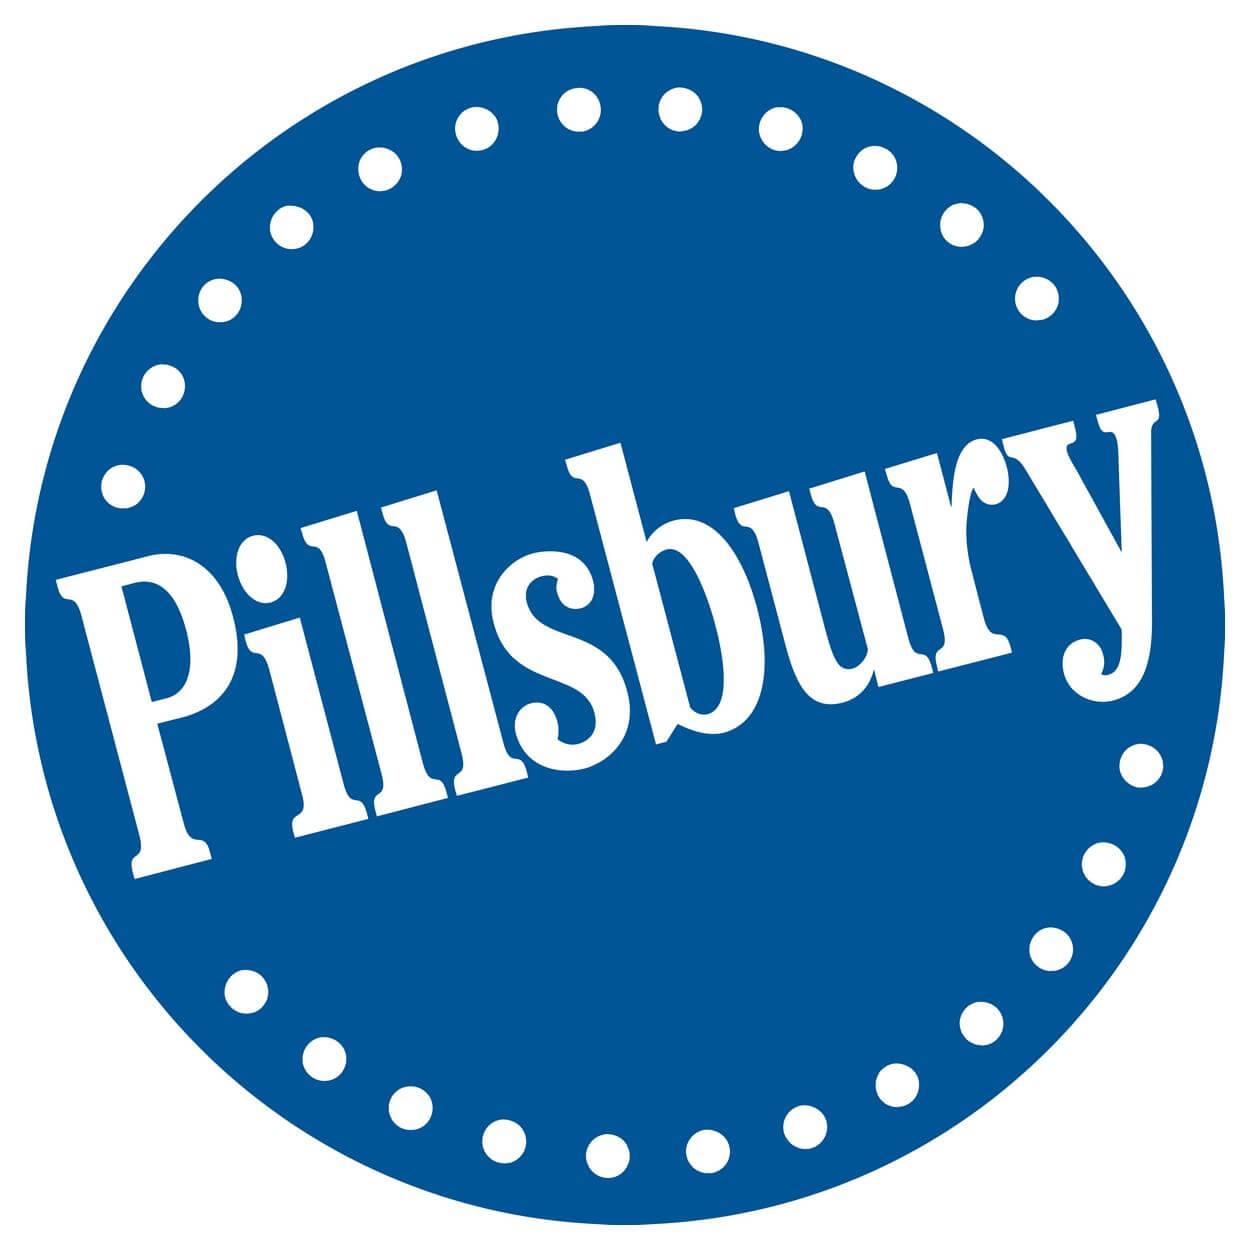 Pillsbury Logo png